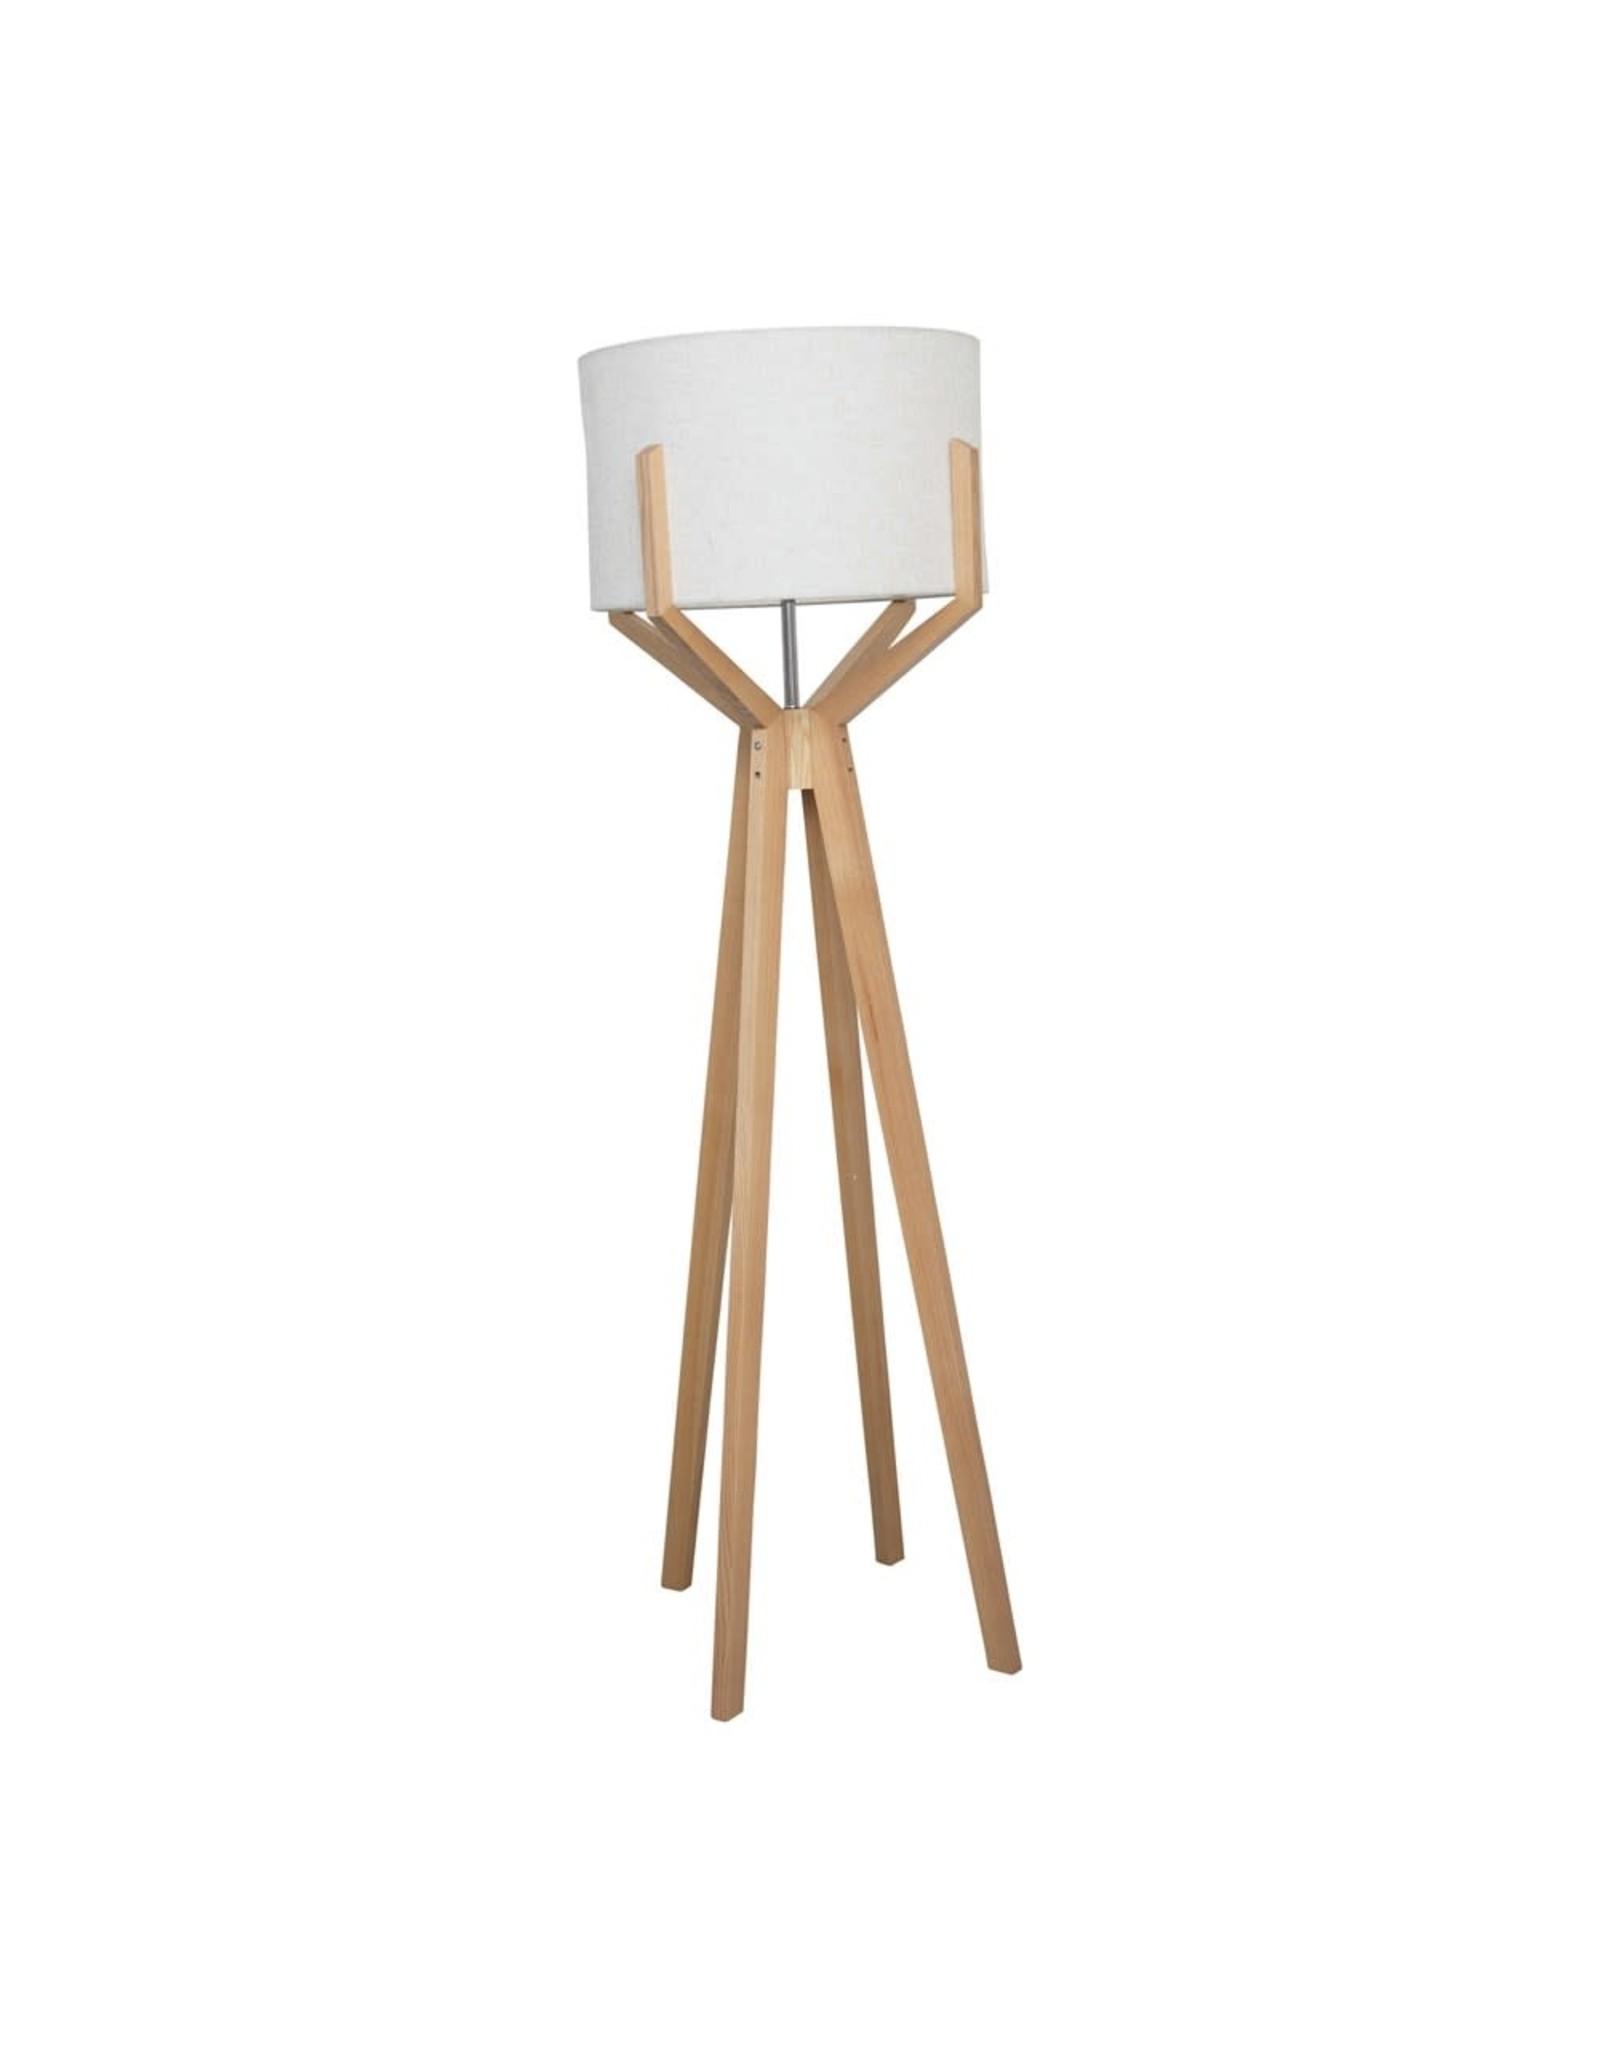 "The Florist & The Merchant 65"" Wood Floor Lamp"